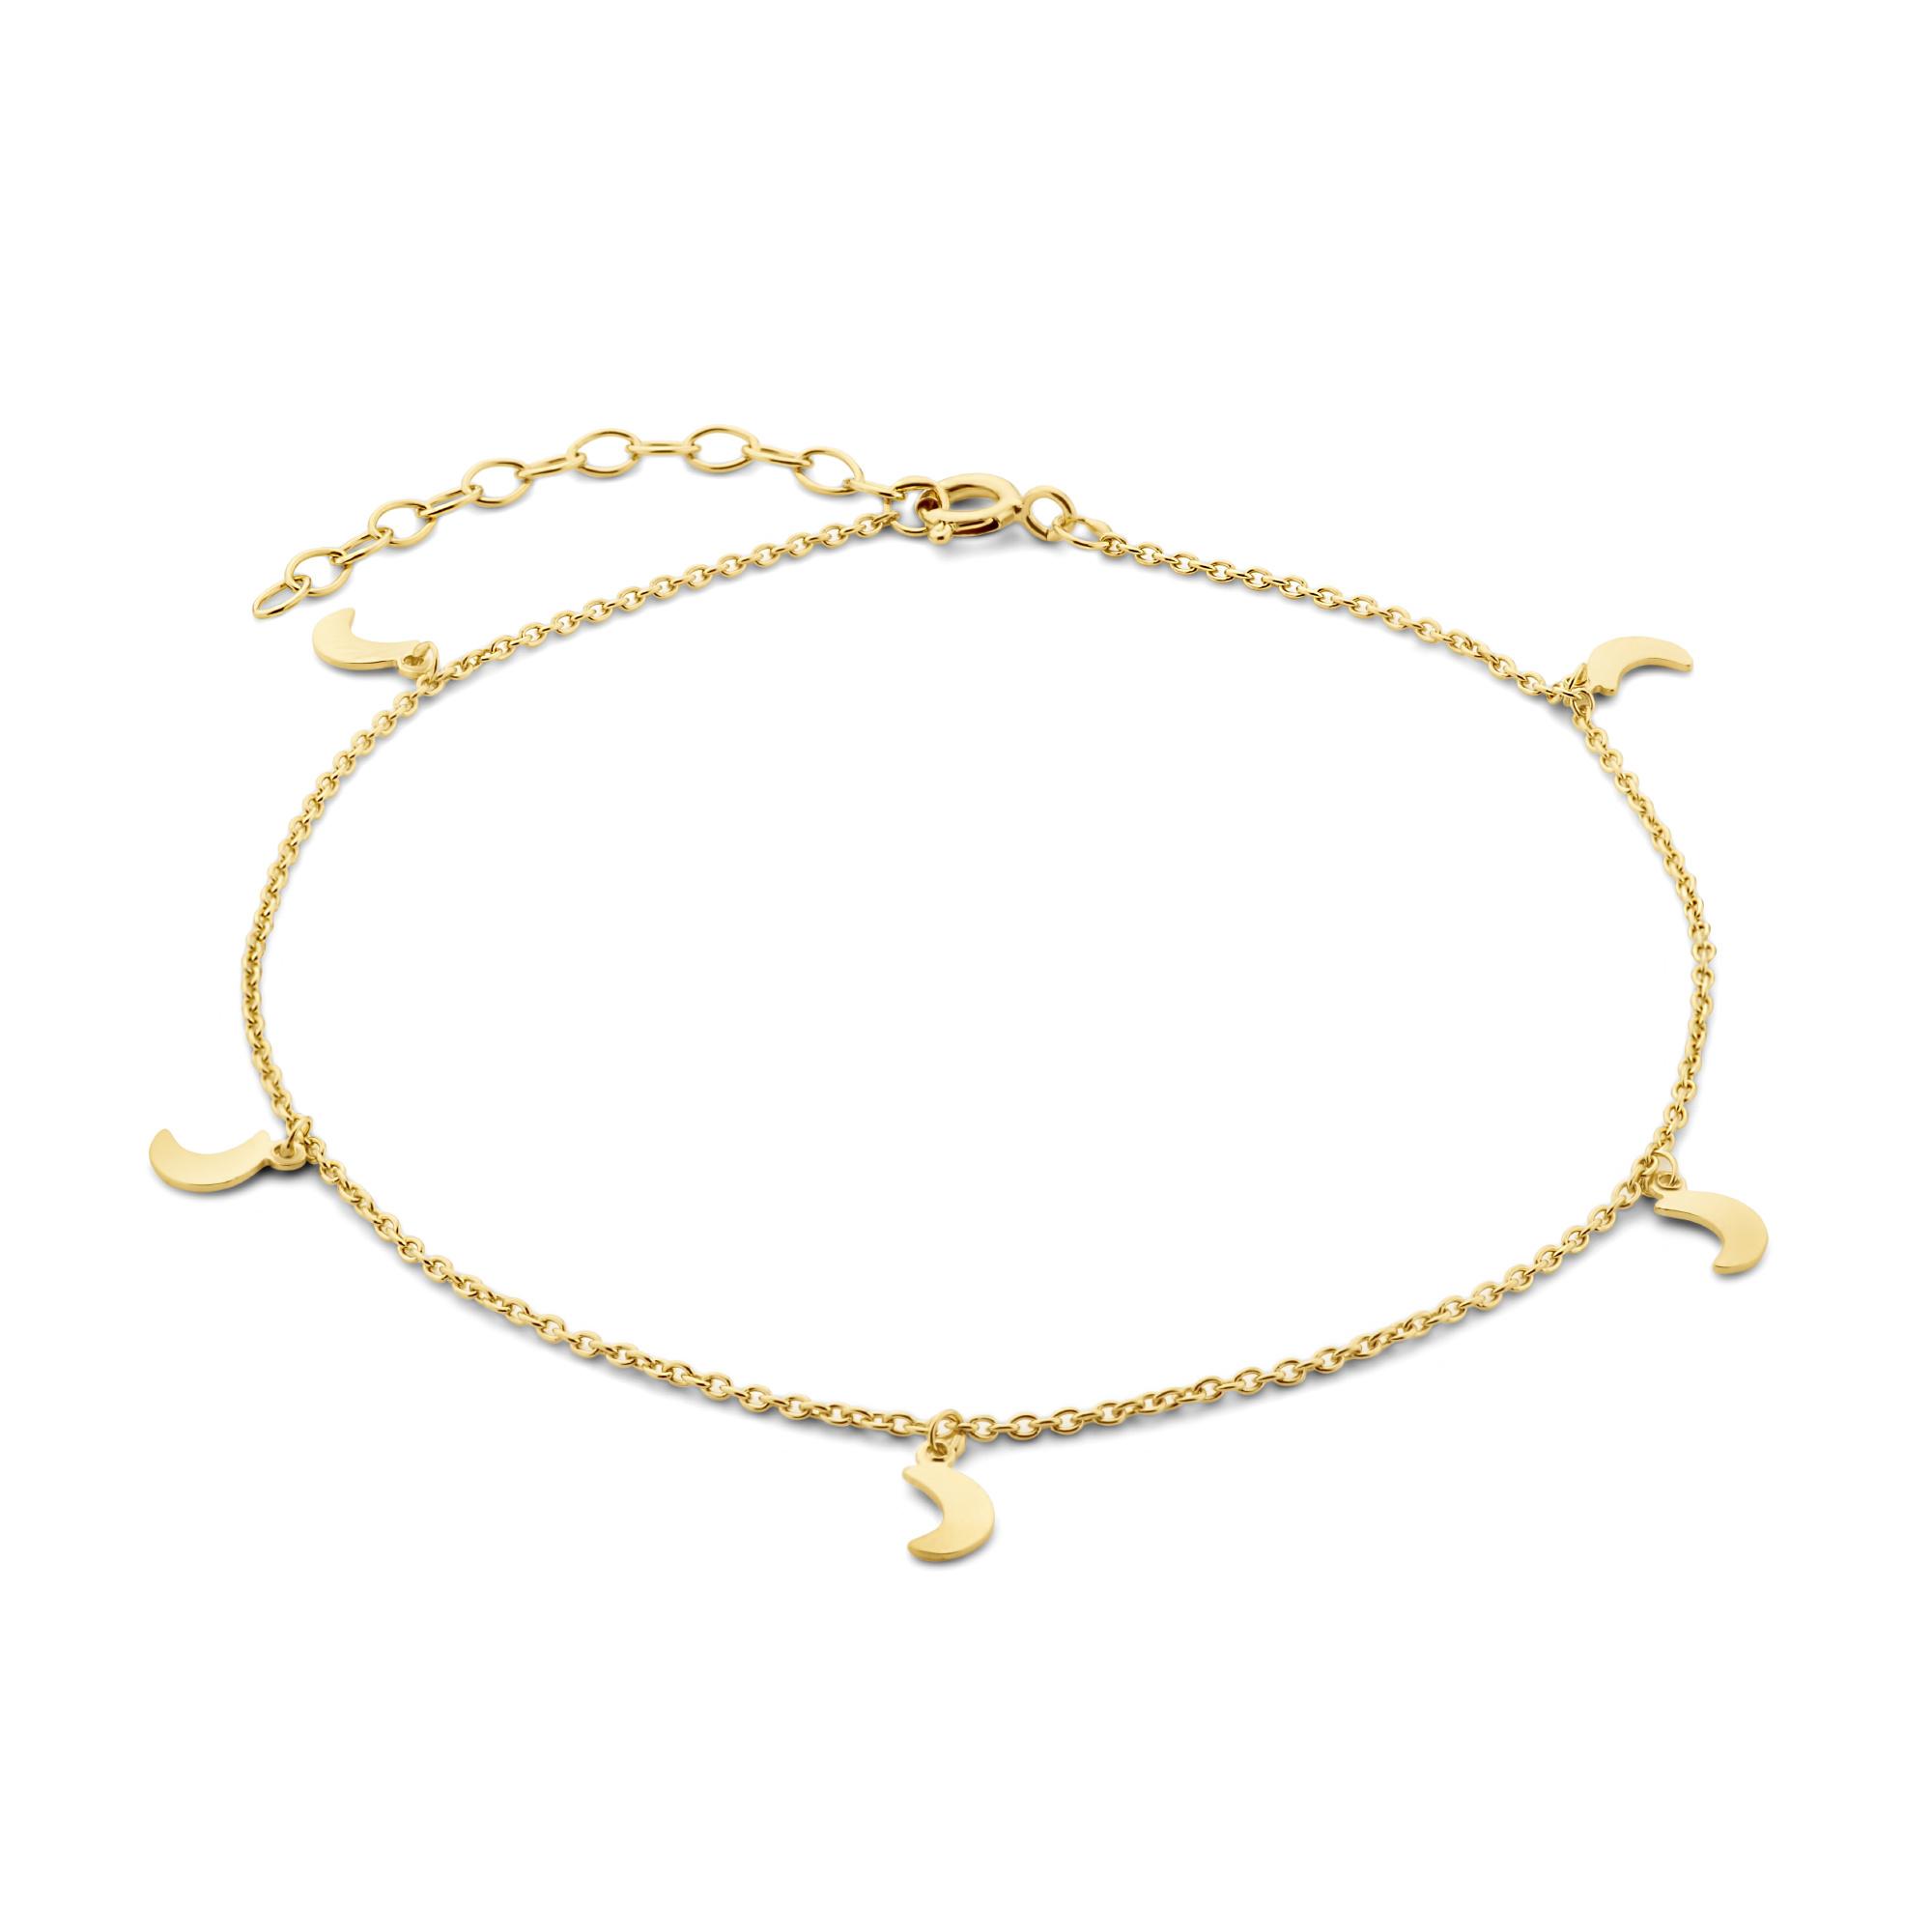 Selected Jewels Julie Louna 925 sterling silver guldfärgad vristlänk